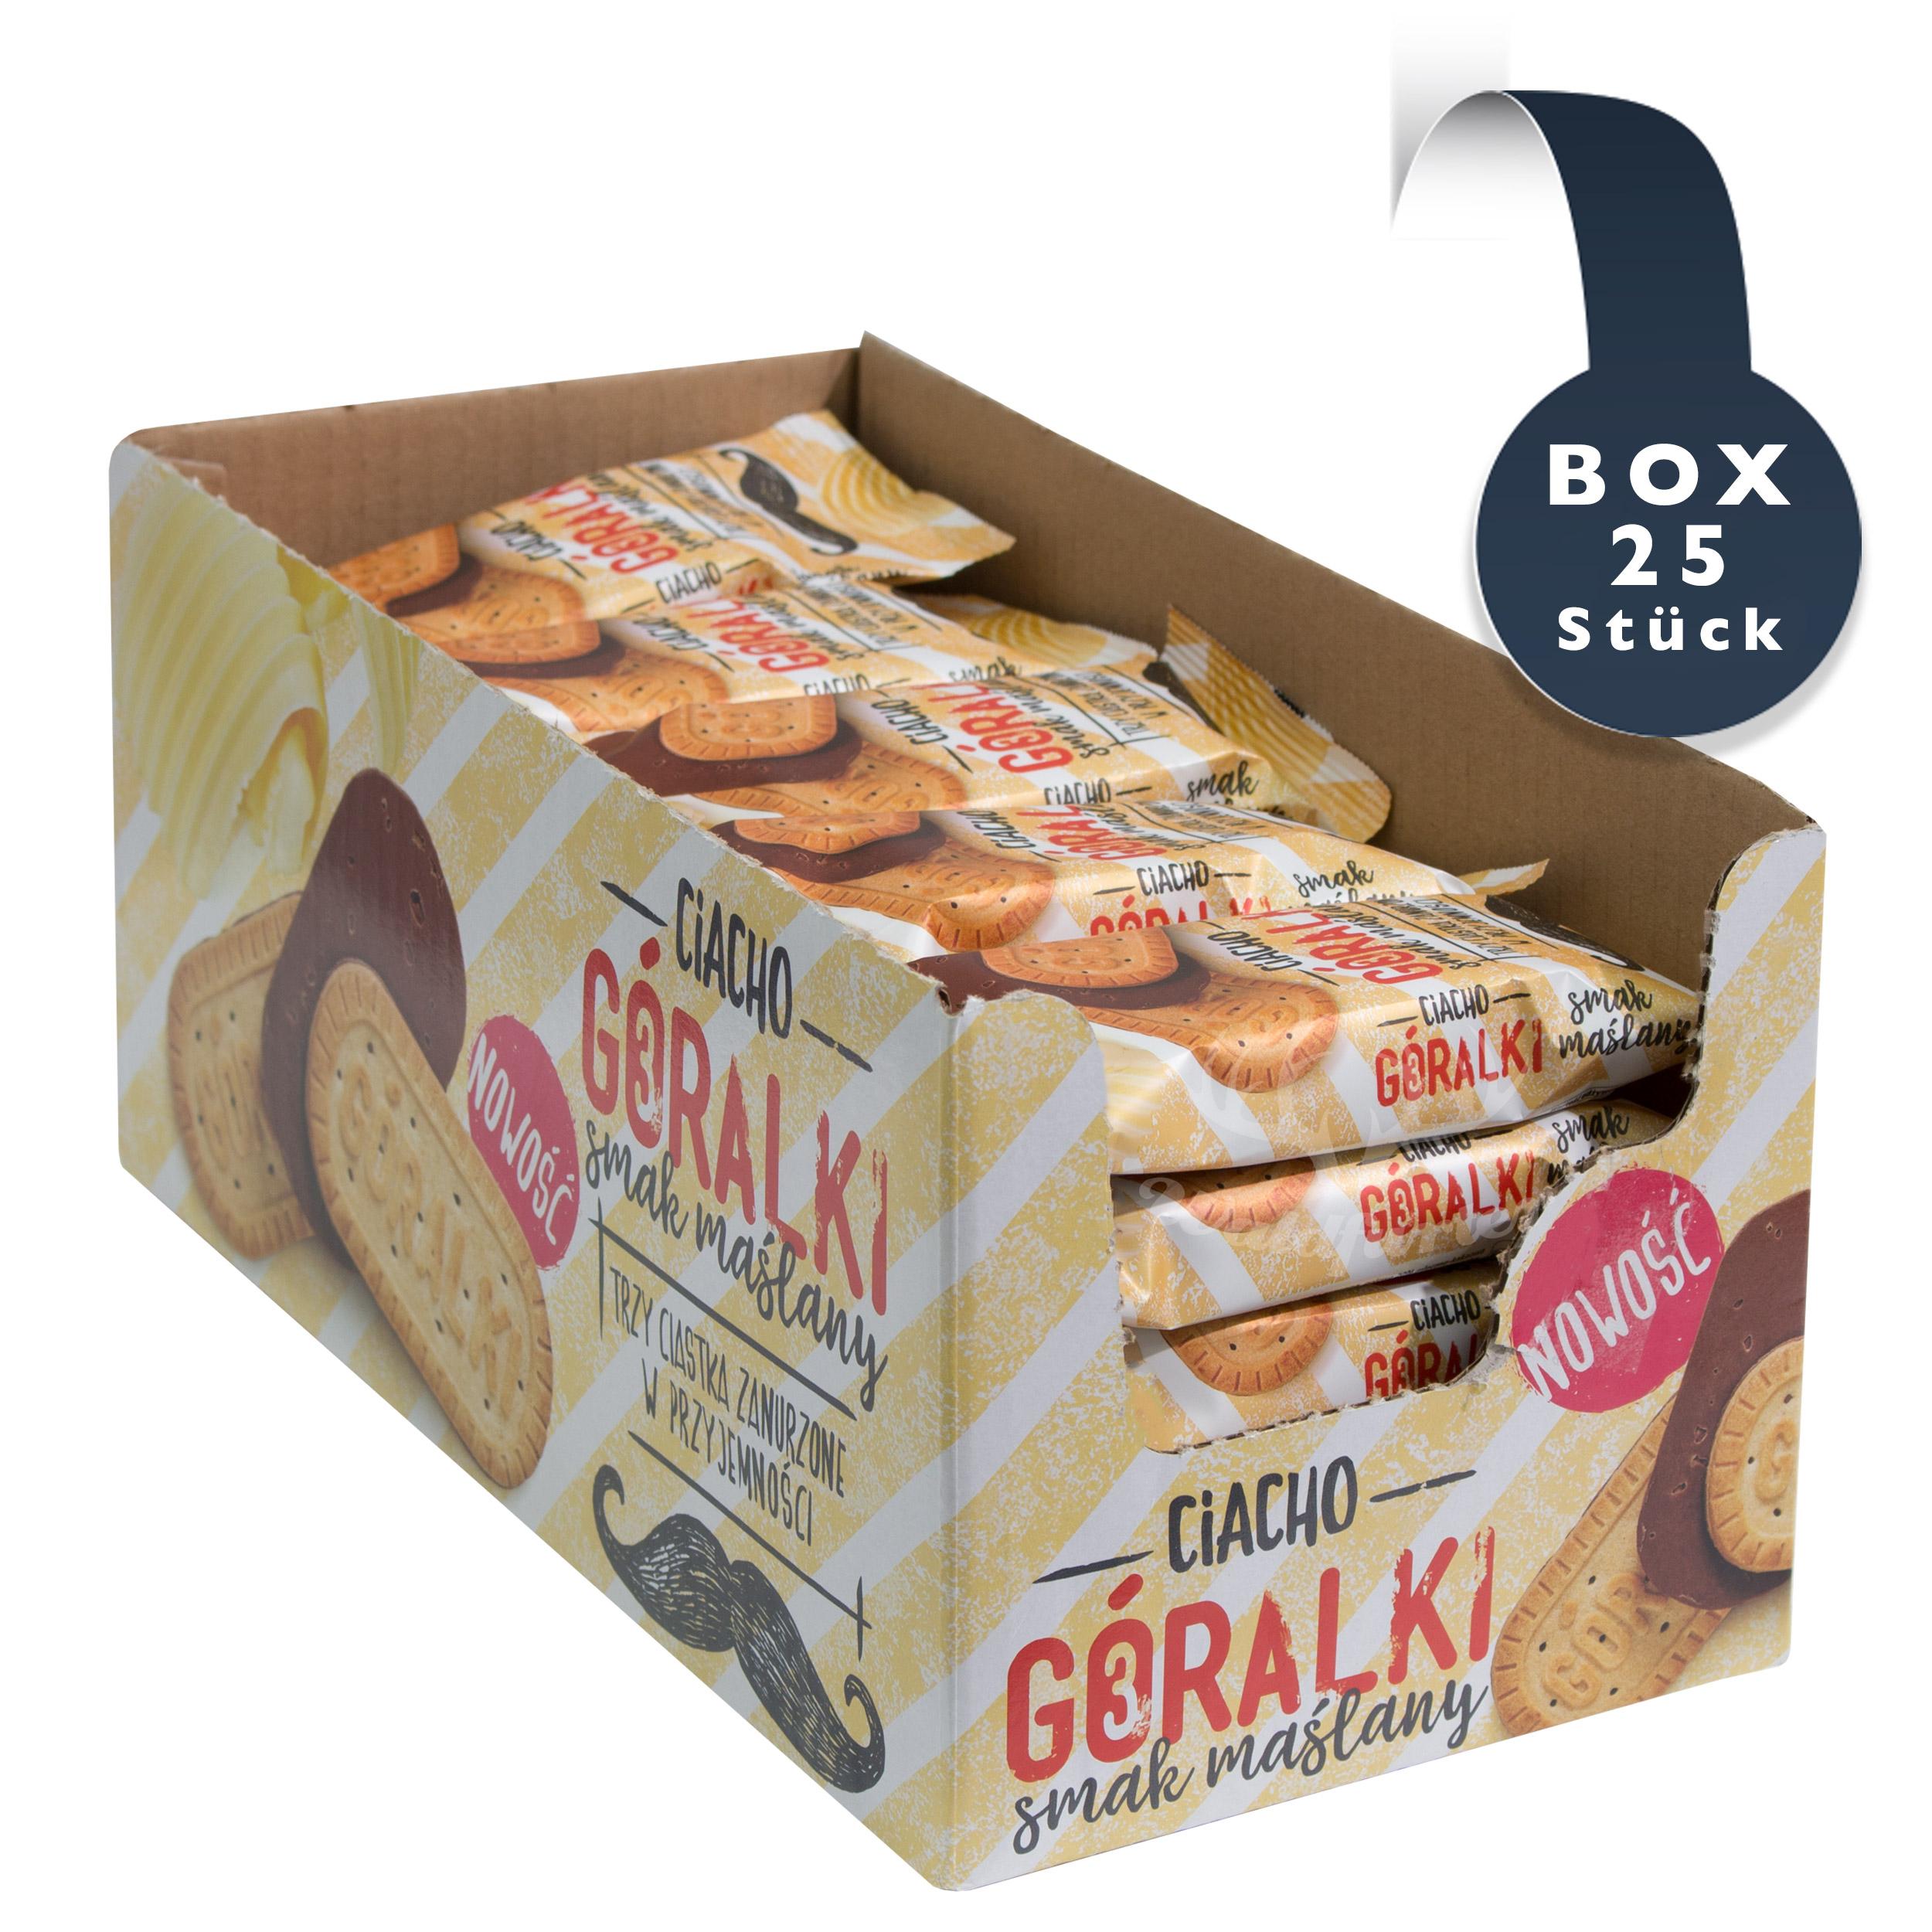 Goralki Kekse mit Kakaogeschmack (PAK 38g x 25 Stück) //   Goralki Ciacho o smaku kakaowym (Karton 38g x 25 sztuk)